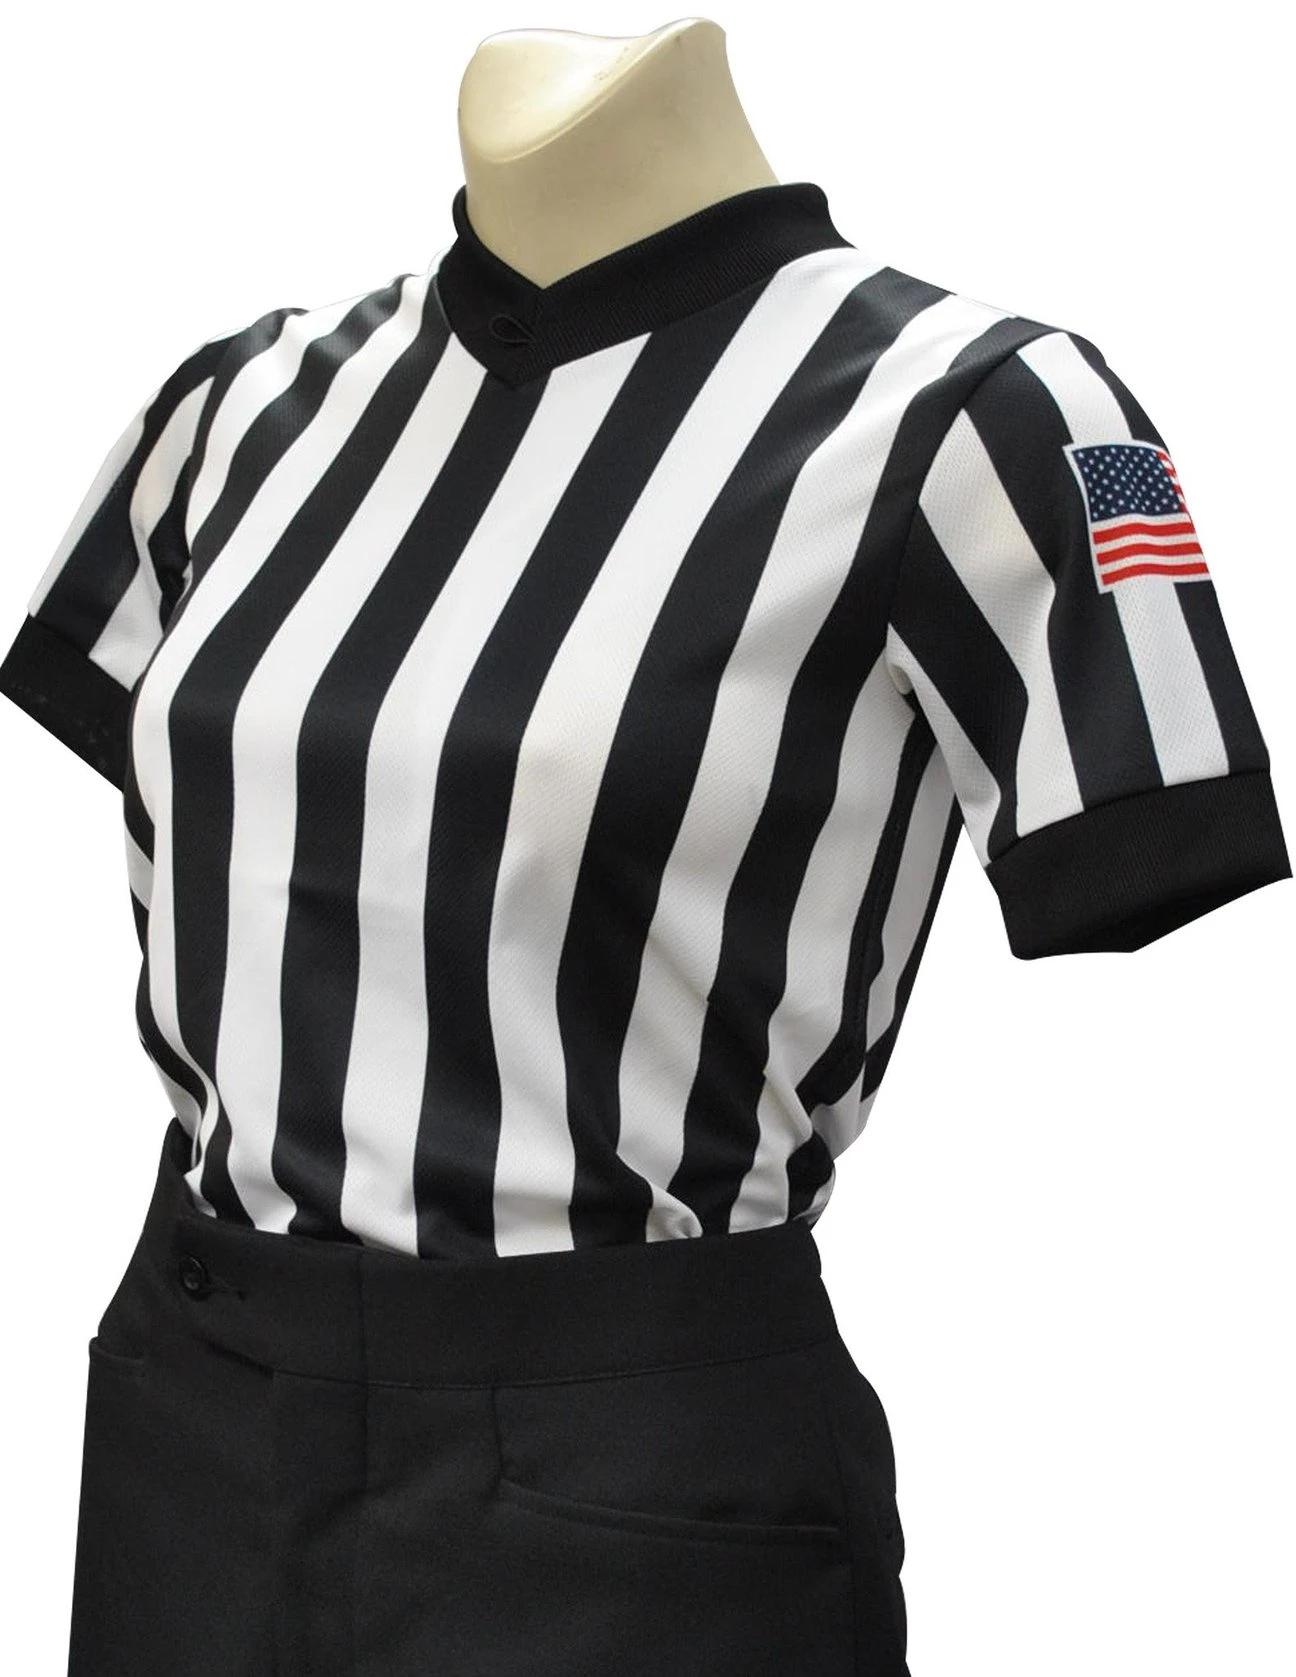 Smitty Women's Basketball Officials Body Flex V-Neck Shirt with USA Flag